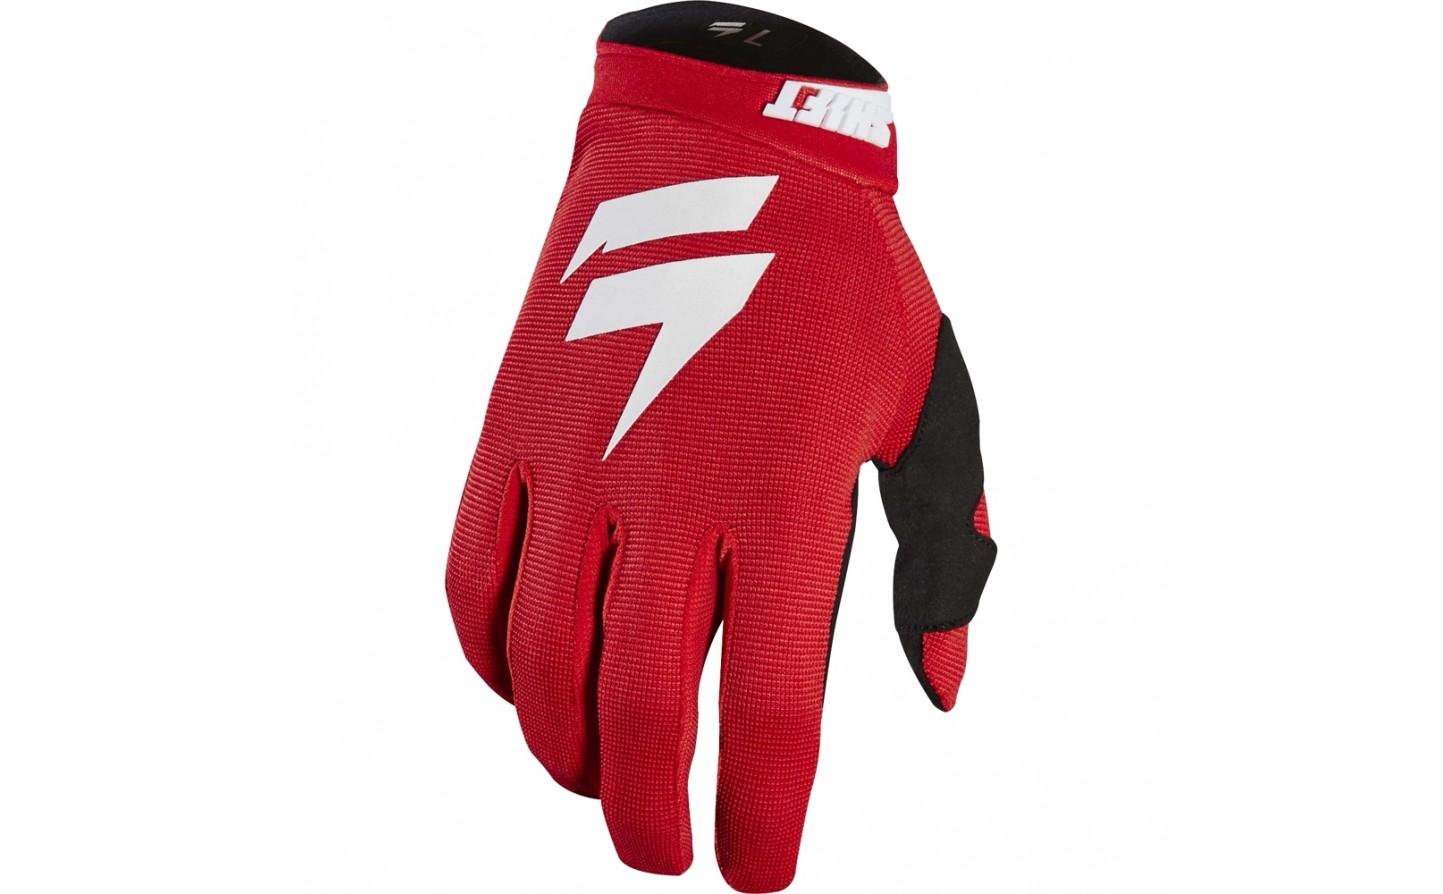 guante shift whit3 air glove  rojo/blanco talle xxl